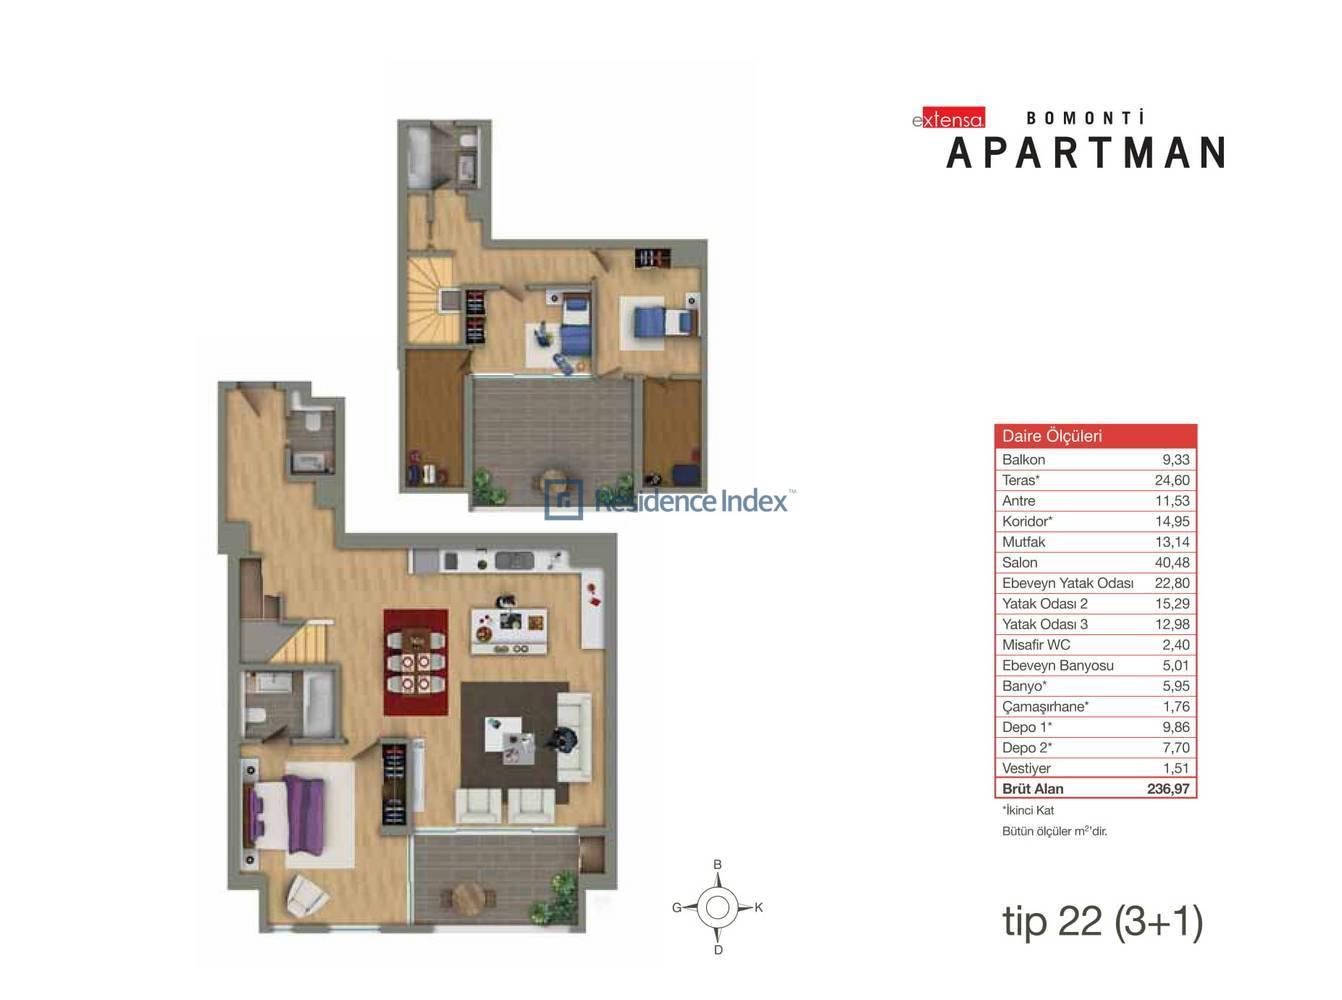 Bomonti Apartmanı Tip 22